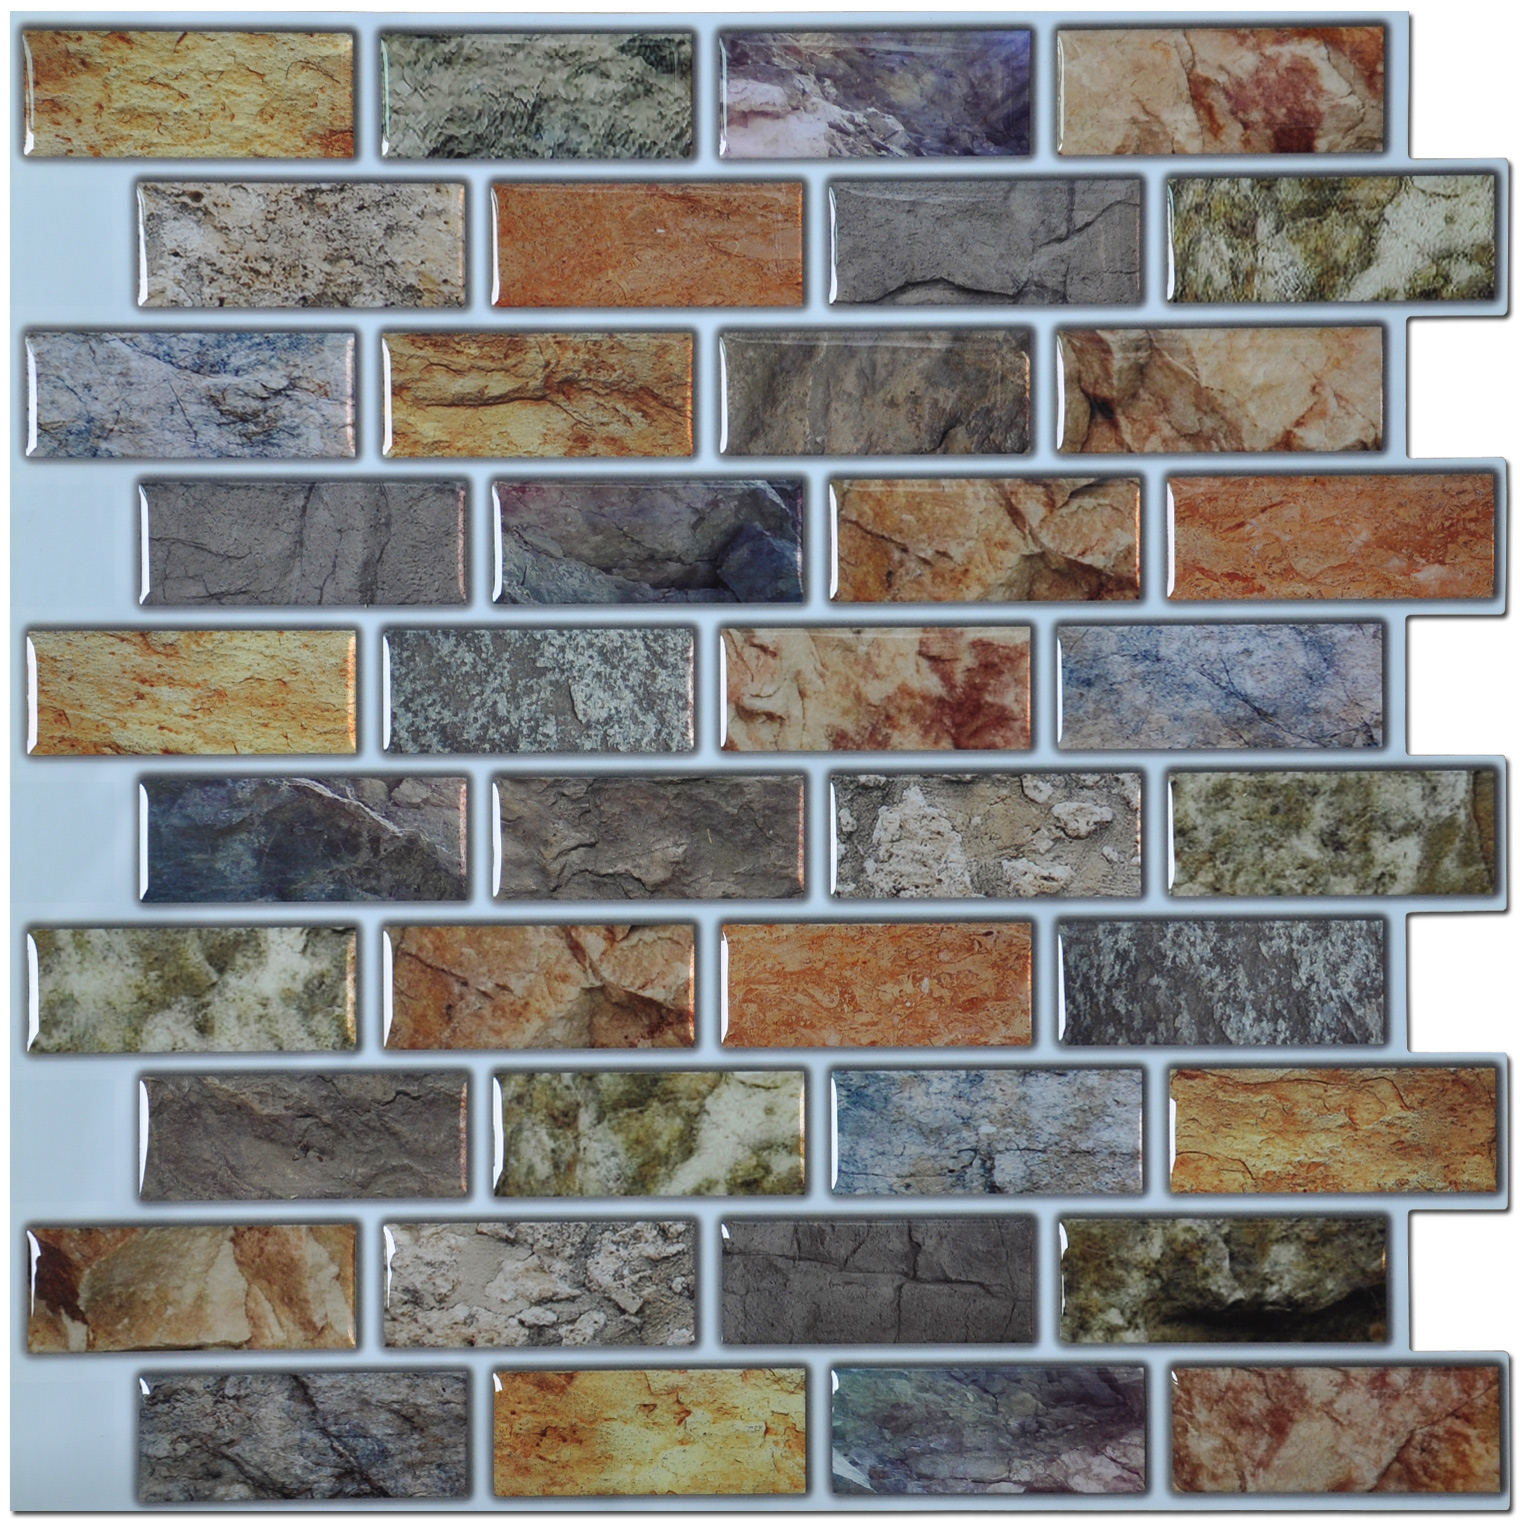 art3d backsplash peel n stick tiles kitchen bathroom backsplash tiles 12 x 12 pack of 6